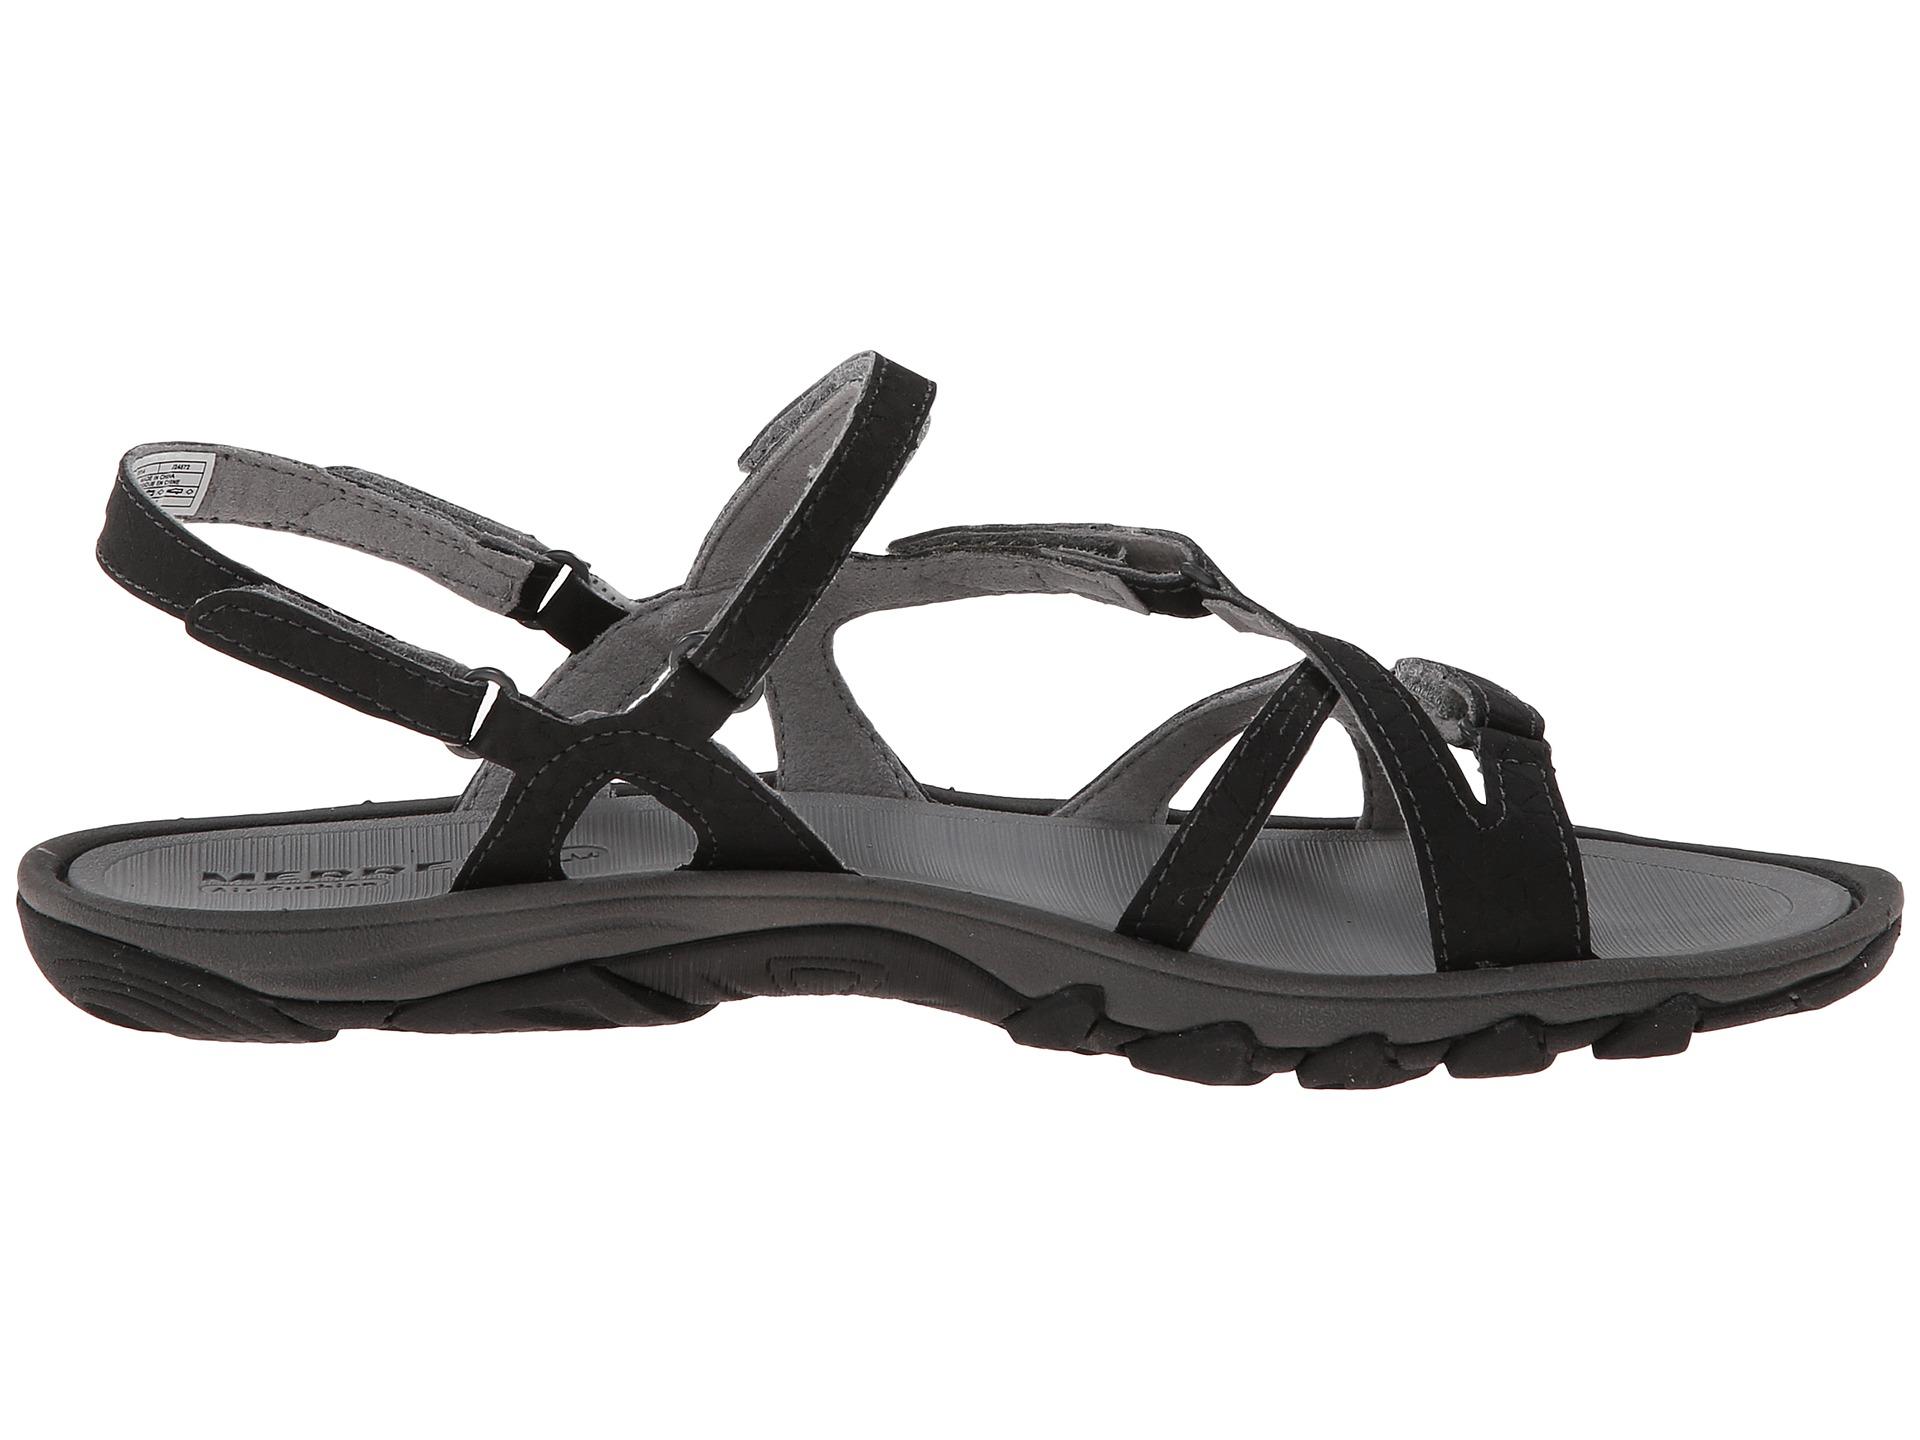 Men Merrell Shoes Images For Sale